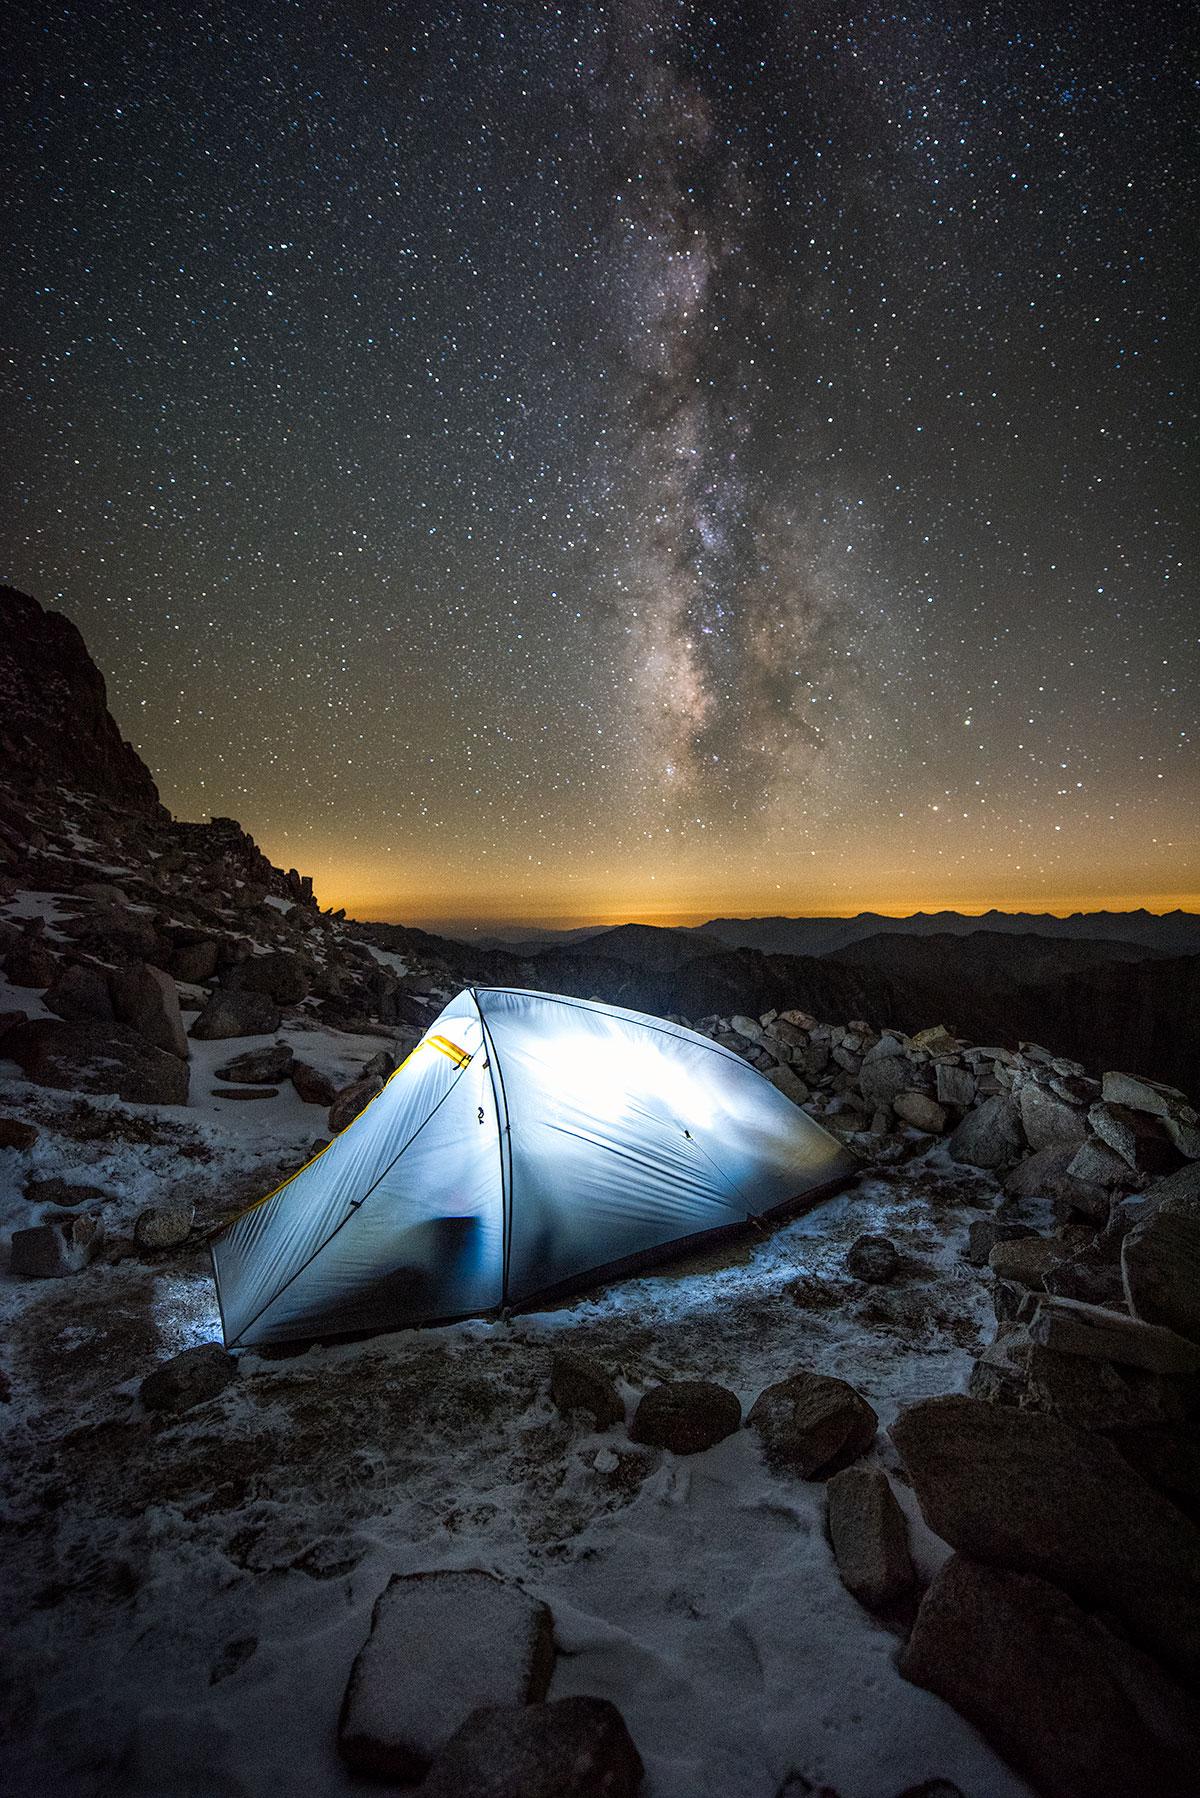 austin-trigg-big-agnes-tent-john-muir-trail-camping-FlyCreek2-bivy-Mount-Whitney-Milky-Way.jpg